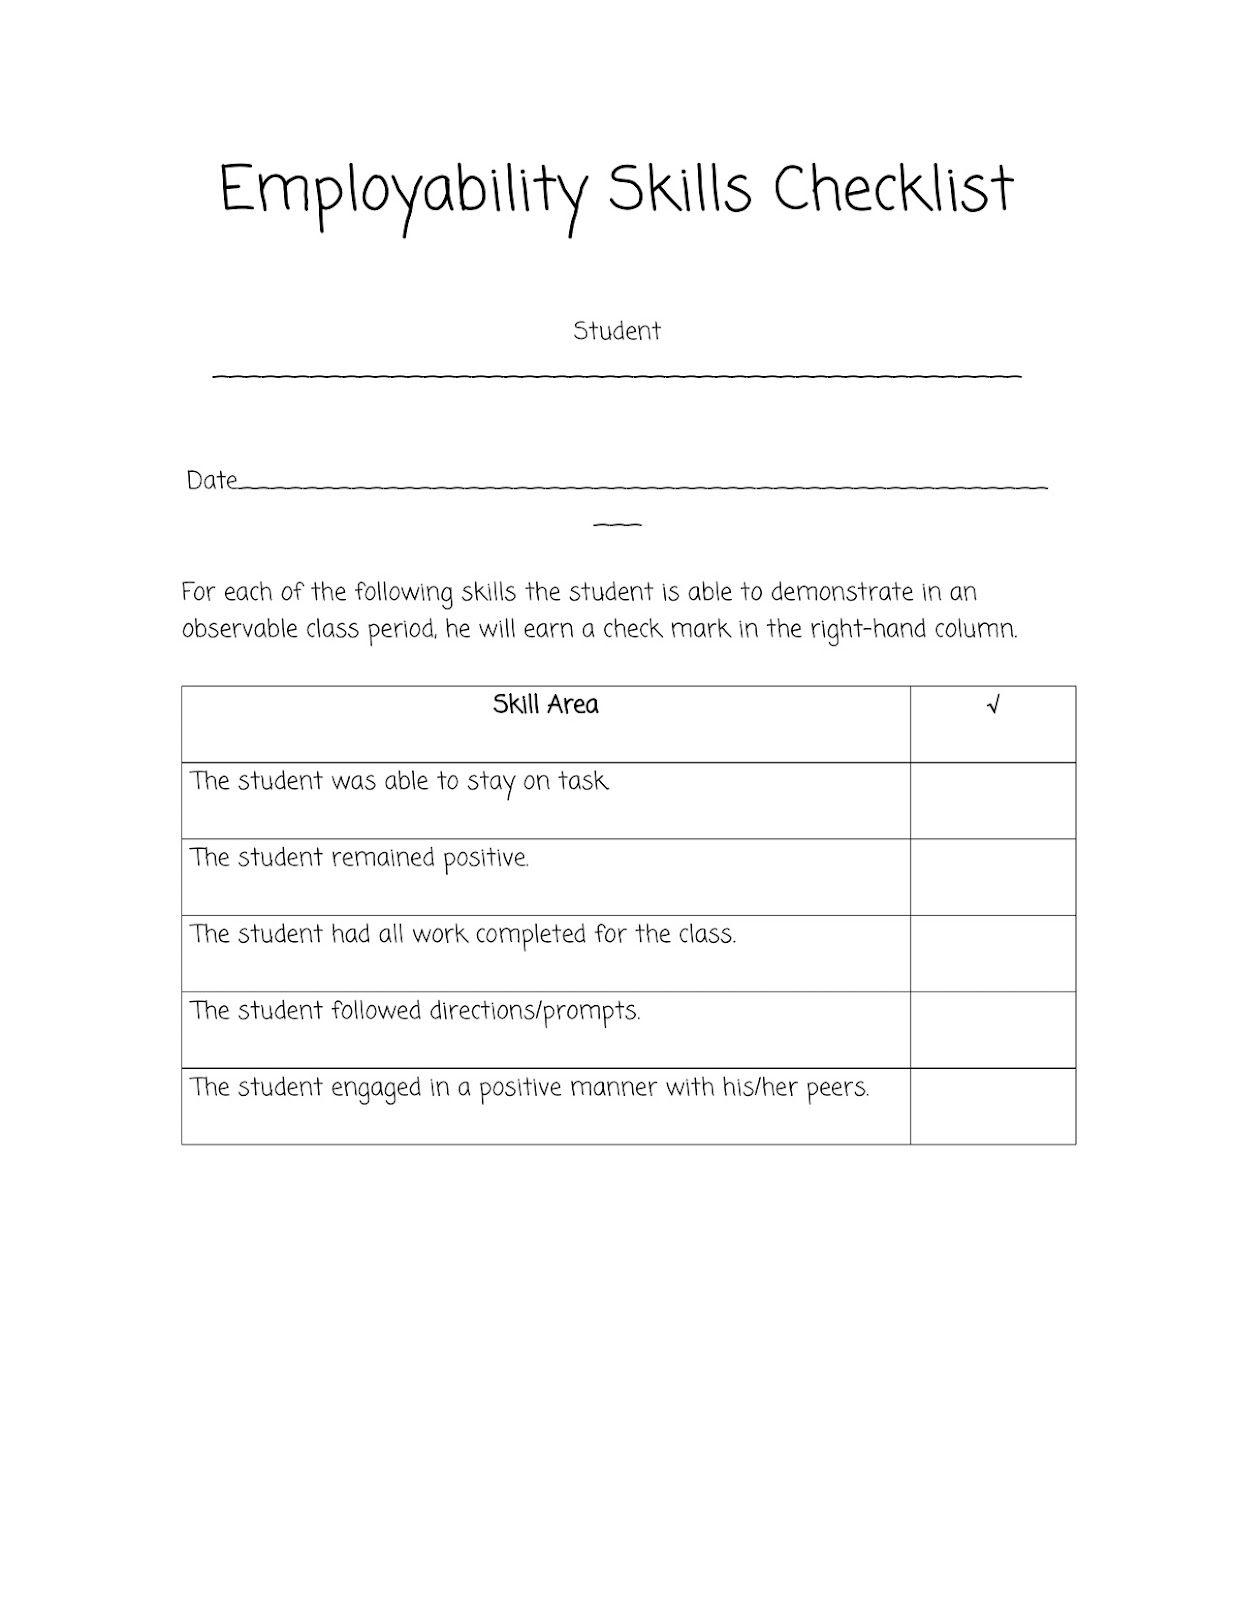 Sped Head Employability Skills Checklist